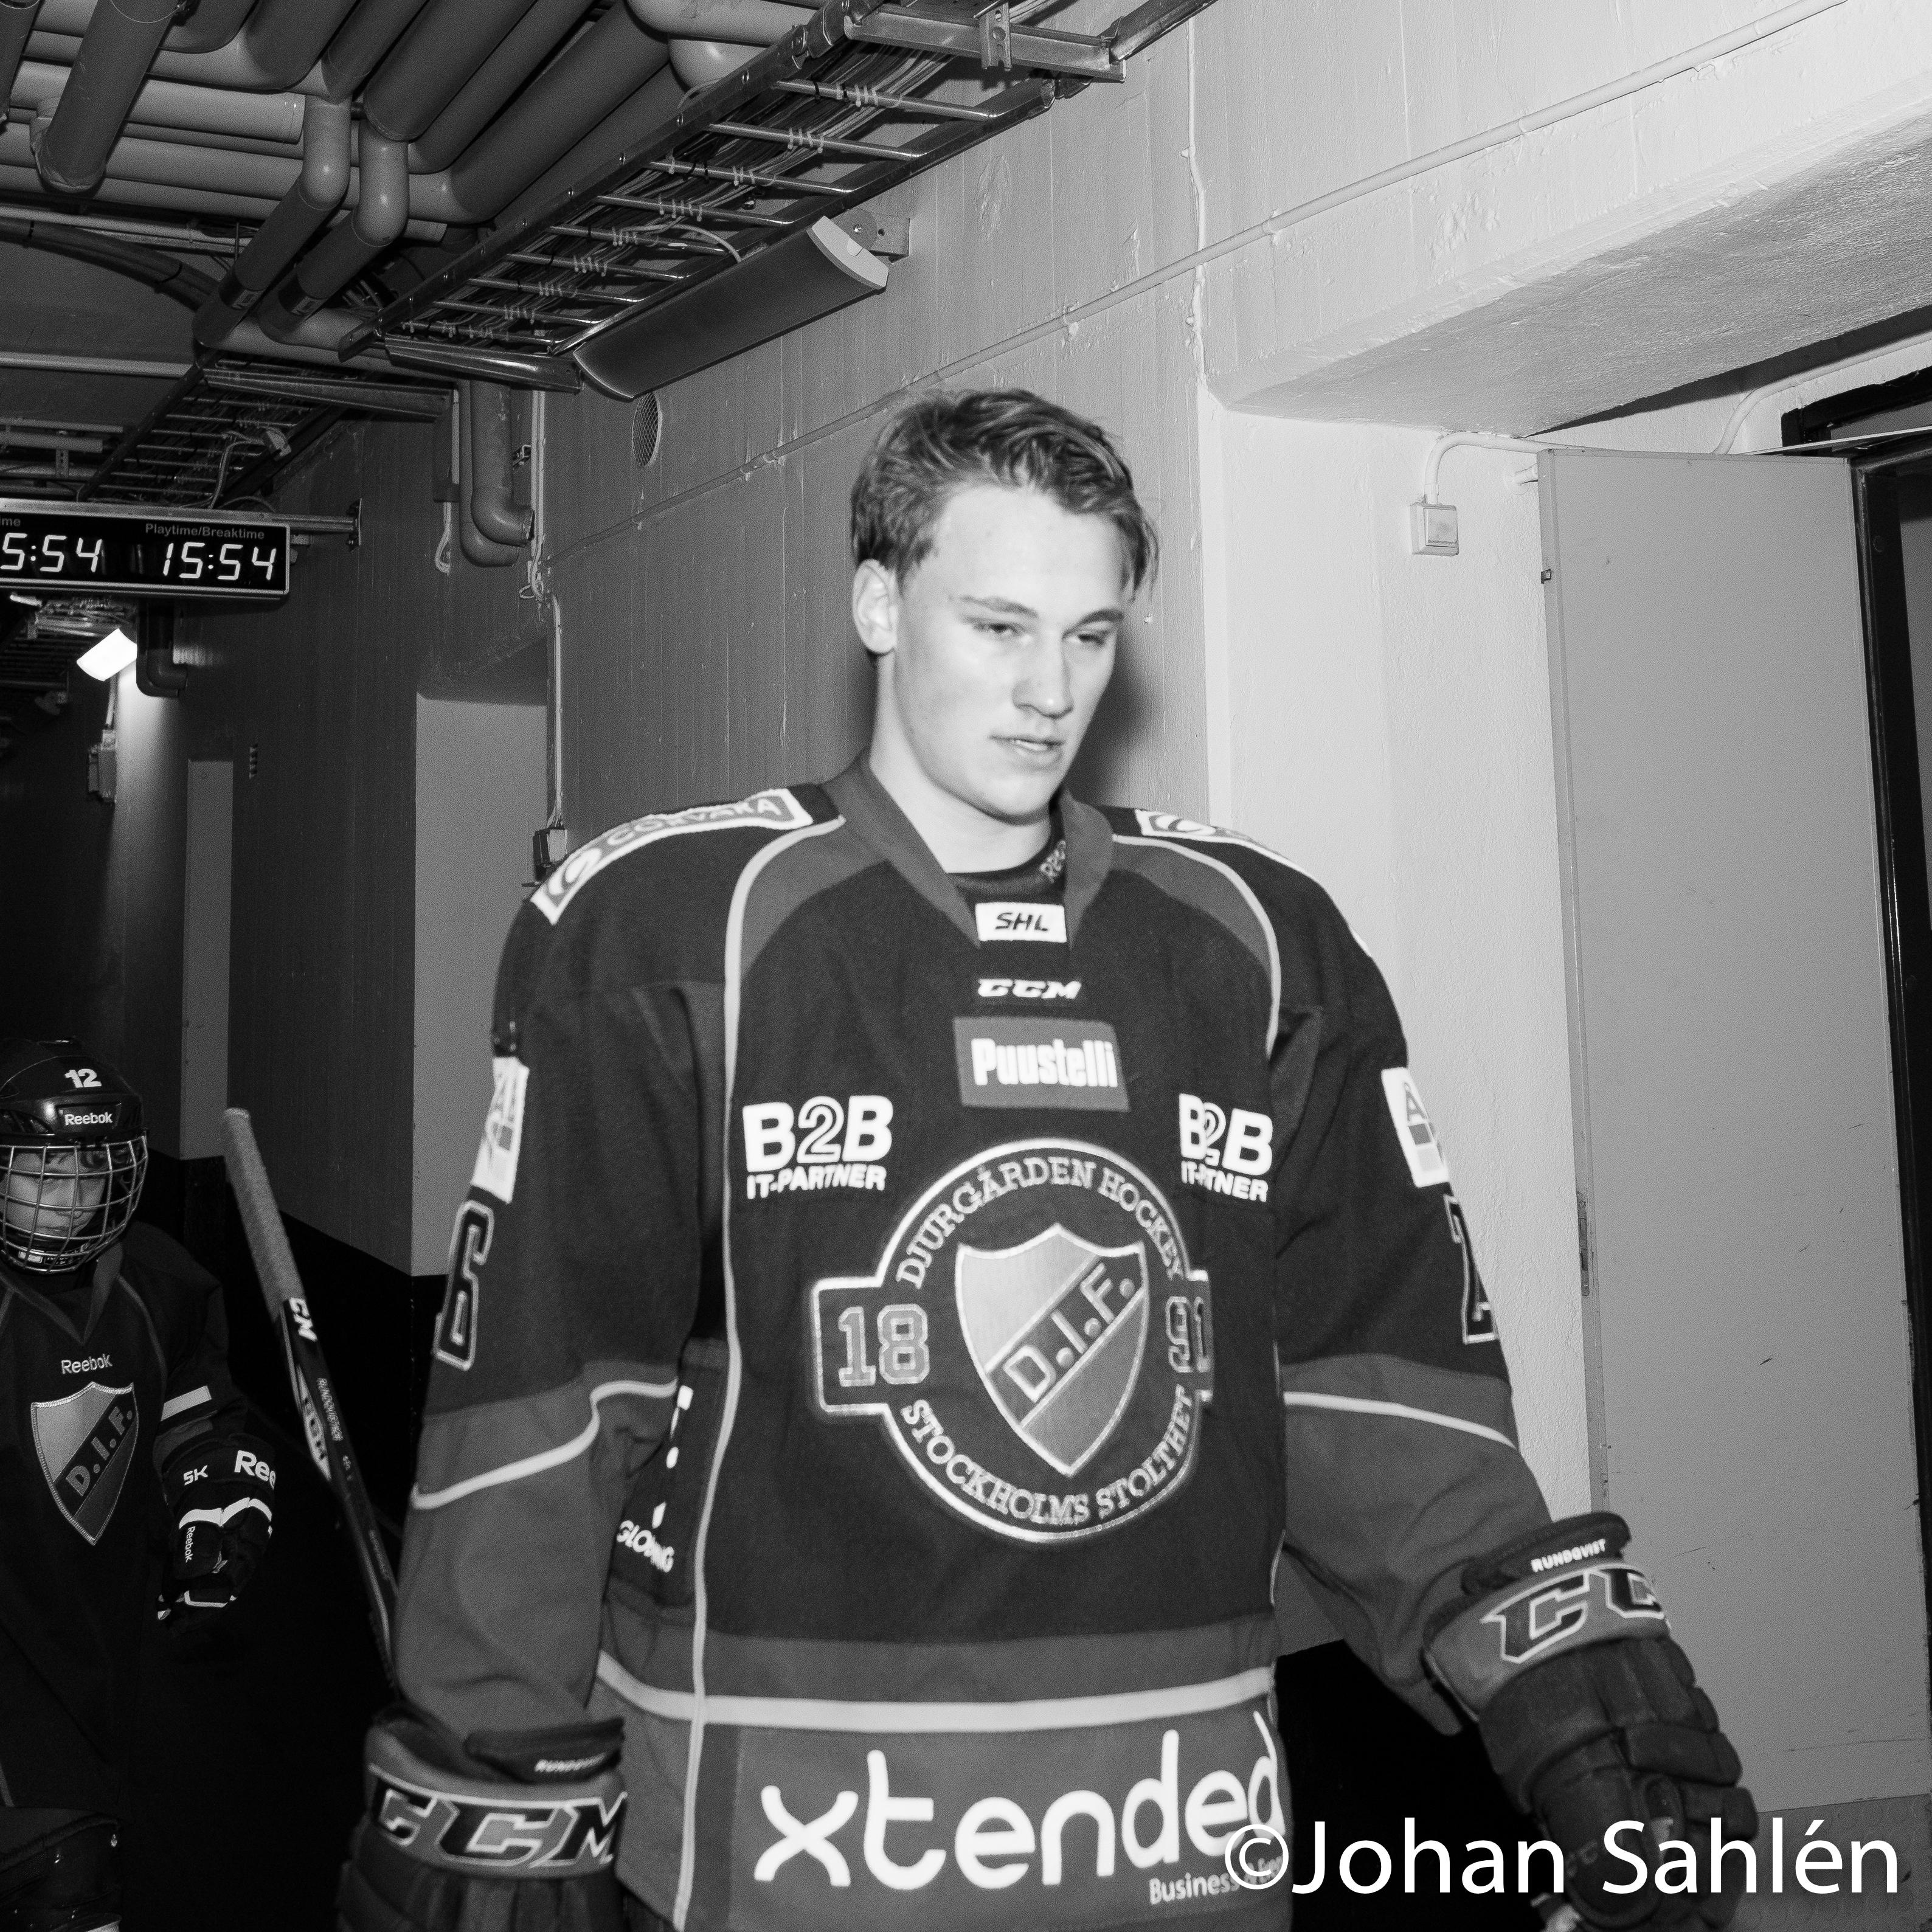 David Rundqvist bw